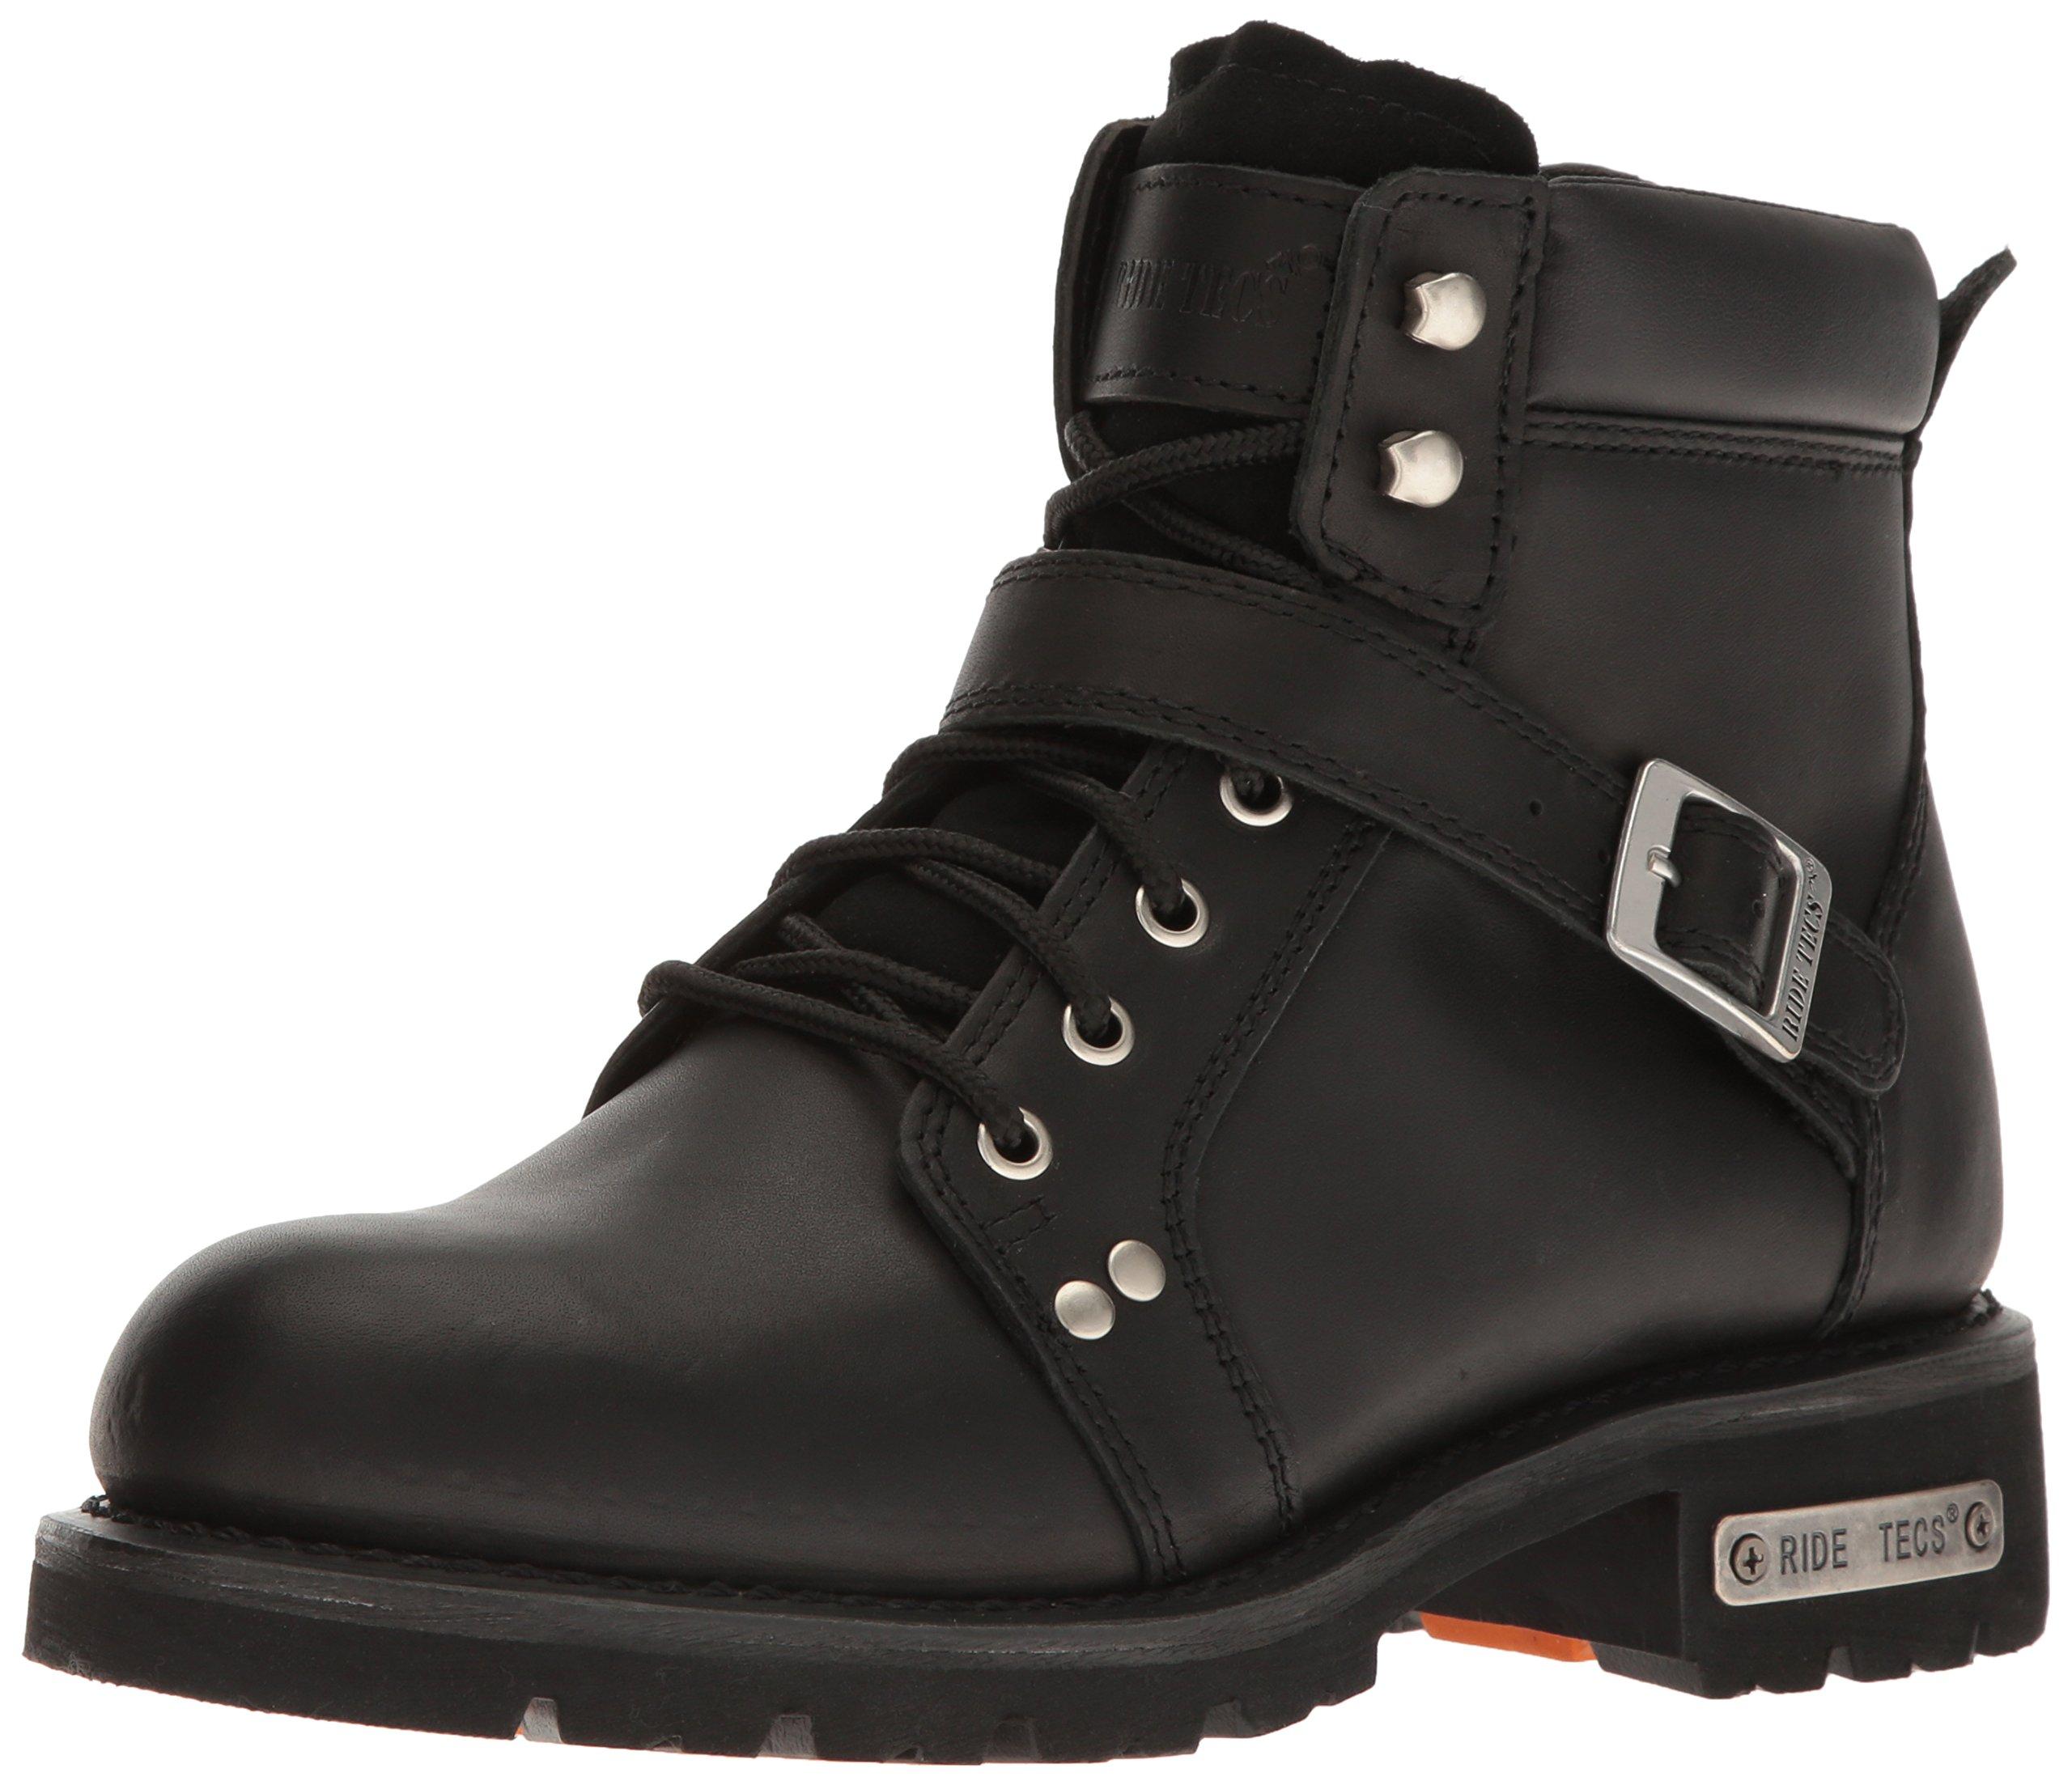 Ride Tec Men's 9143 6'' Lace Zipper Work Boot, Black, 11 W US